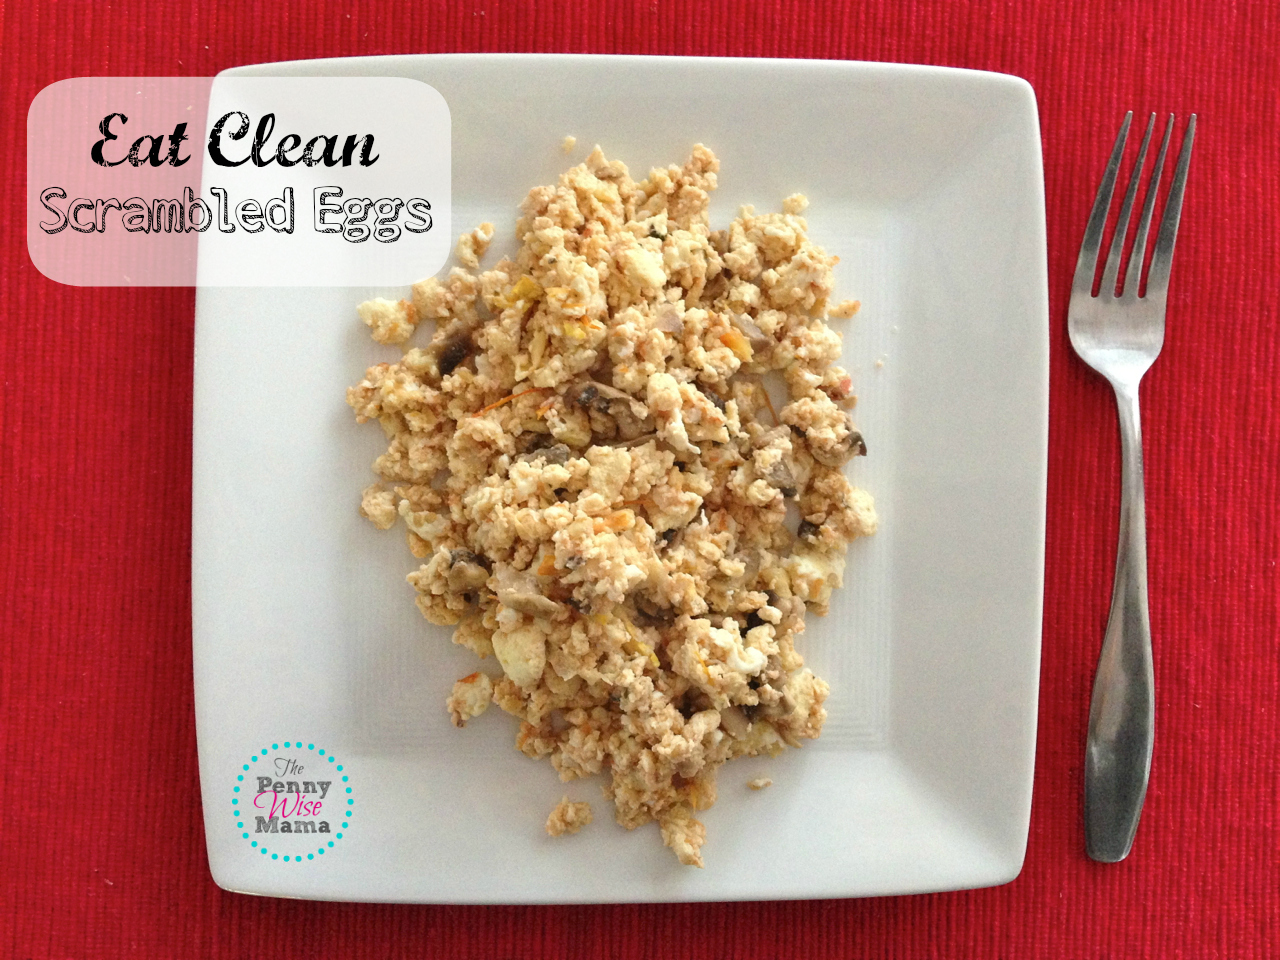 eat clean scrambled eggs